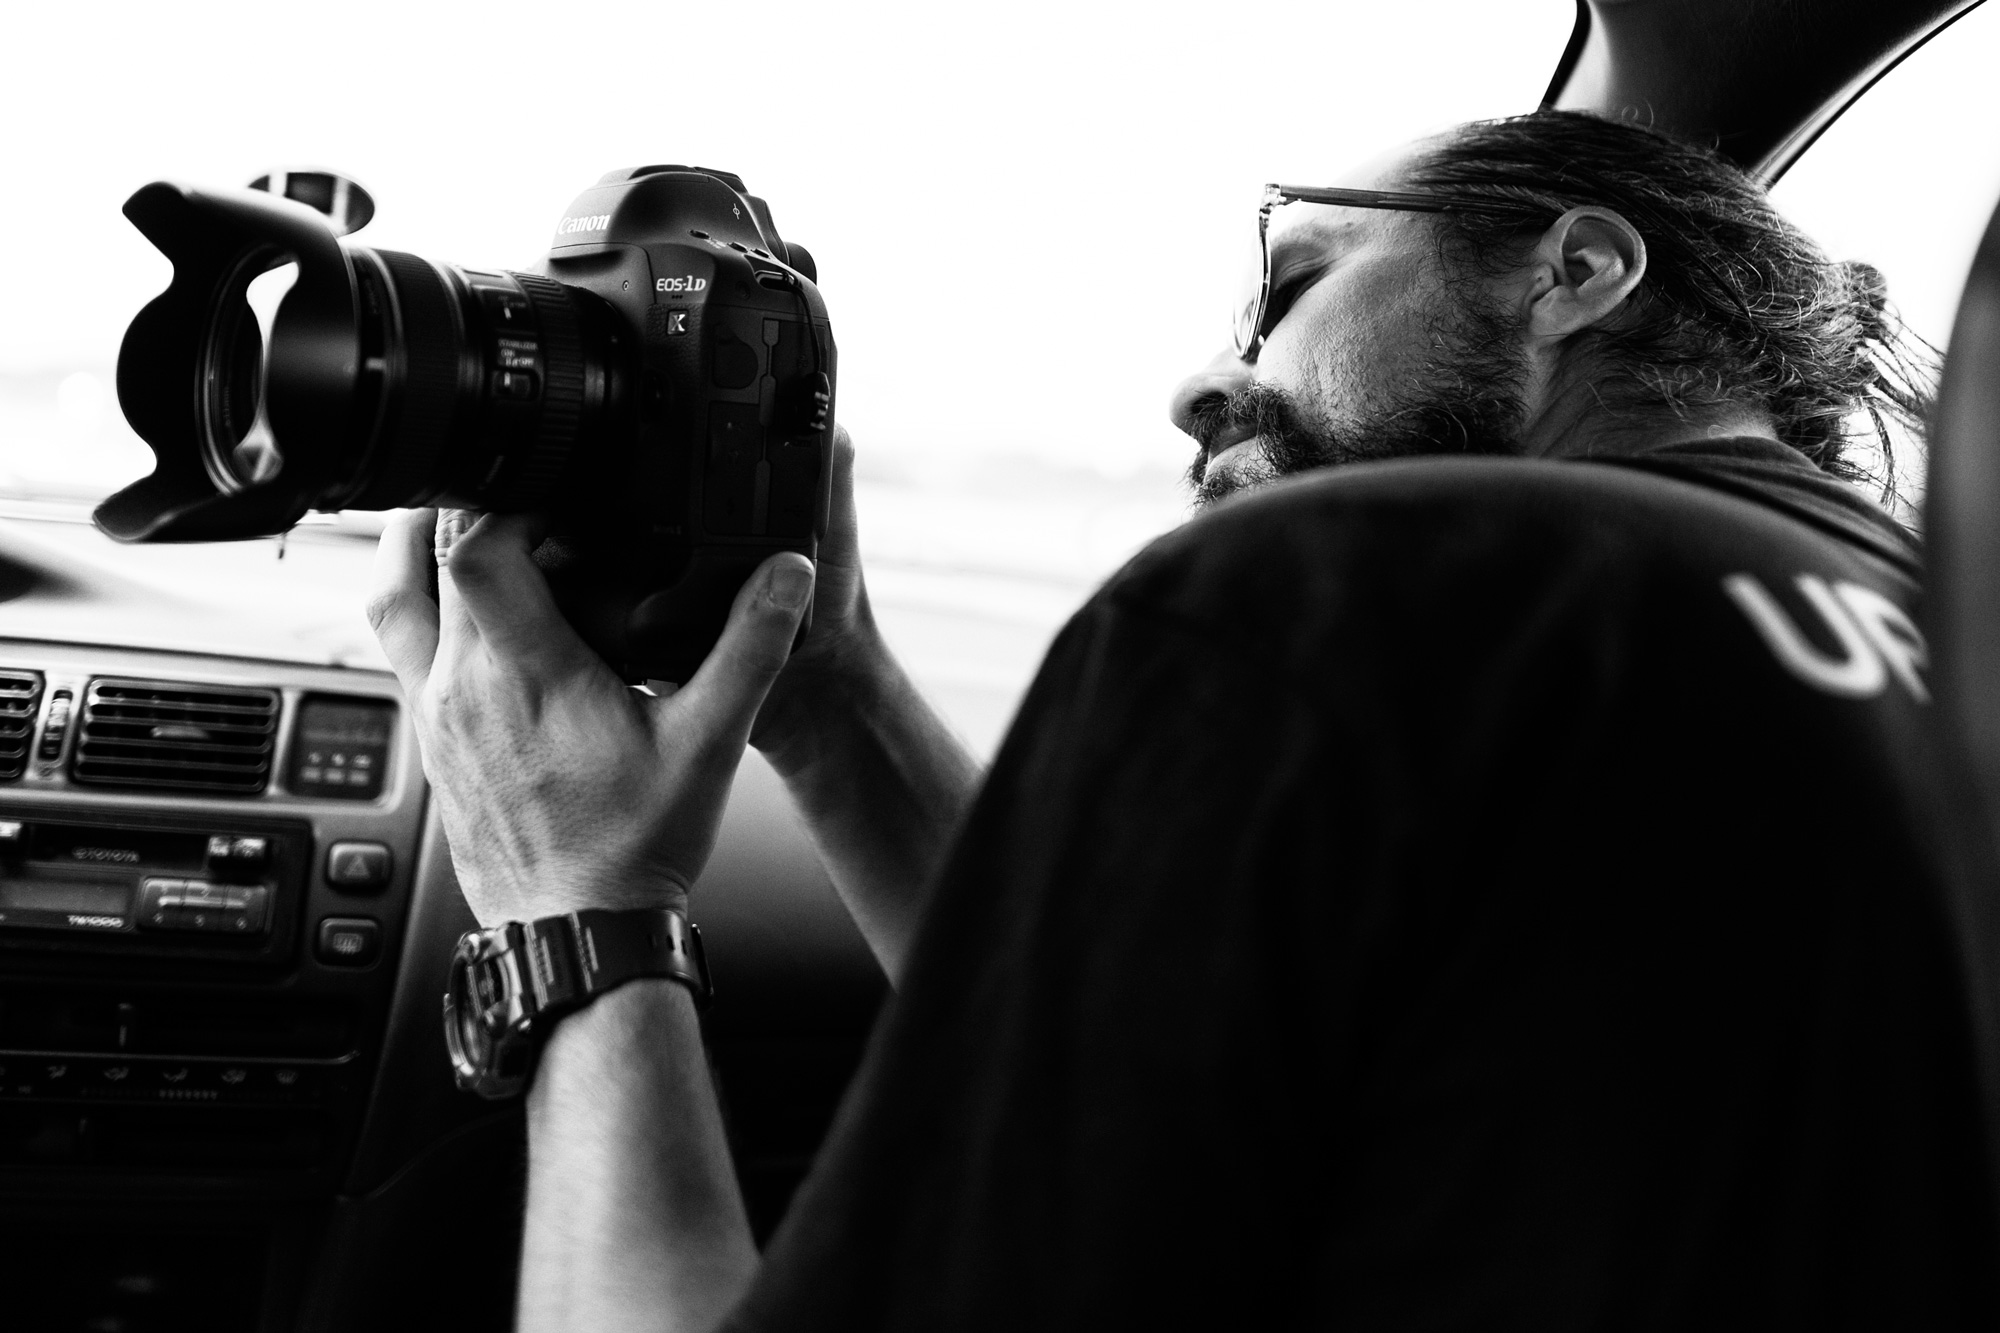 IMG_8930_Me_filming_small.jpg